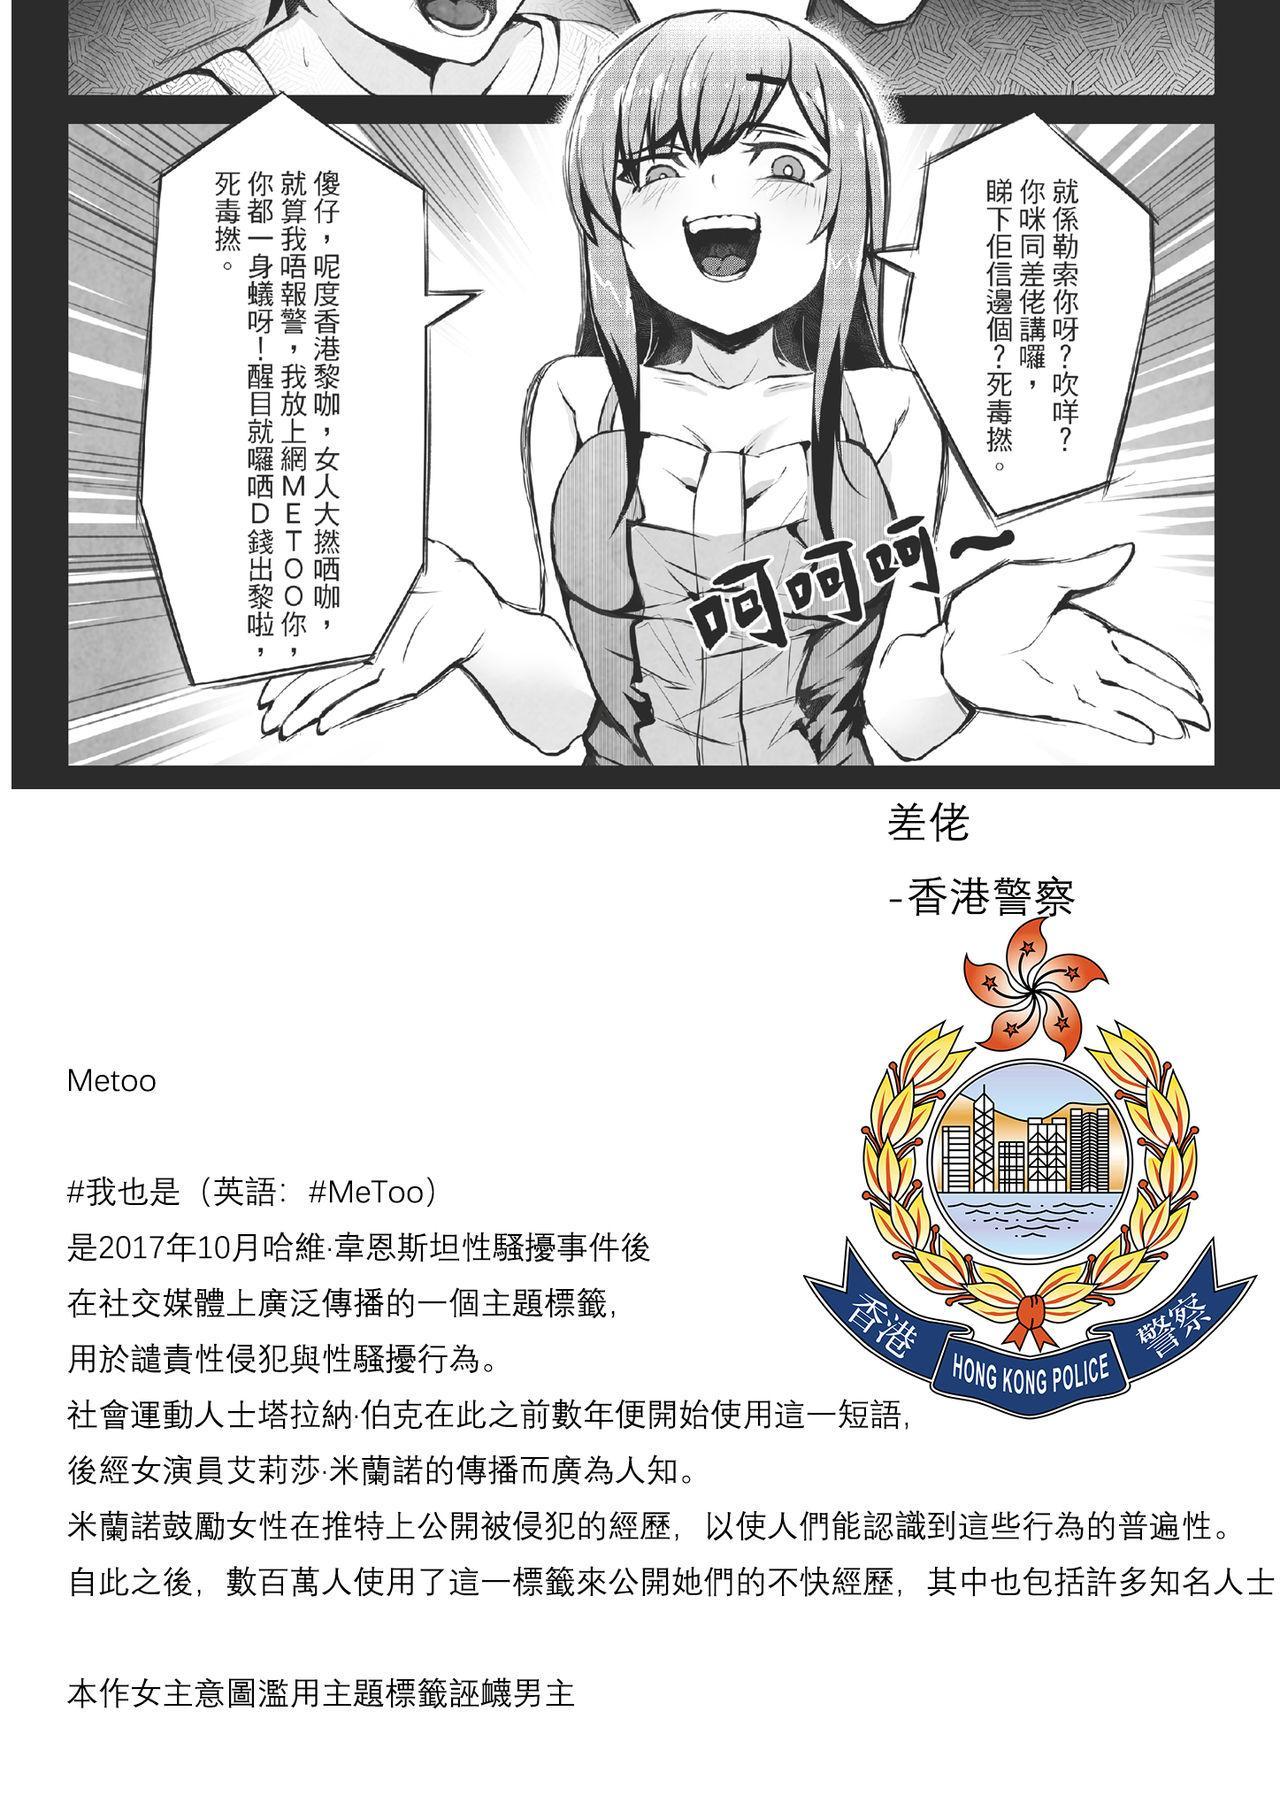 [Gantou Ikunoro] MK girl embodies the spirit of Hong Kong under the Lion Rock [Chinese]  [君廣東話本當上手機翻漢化組] v2 30